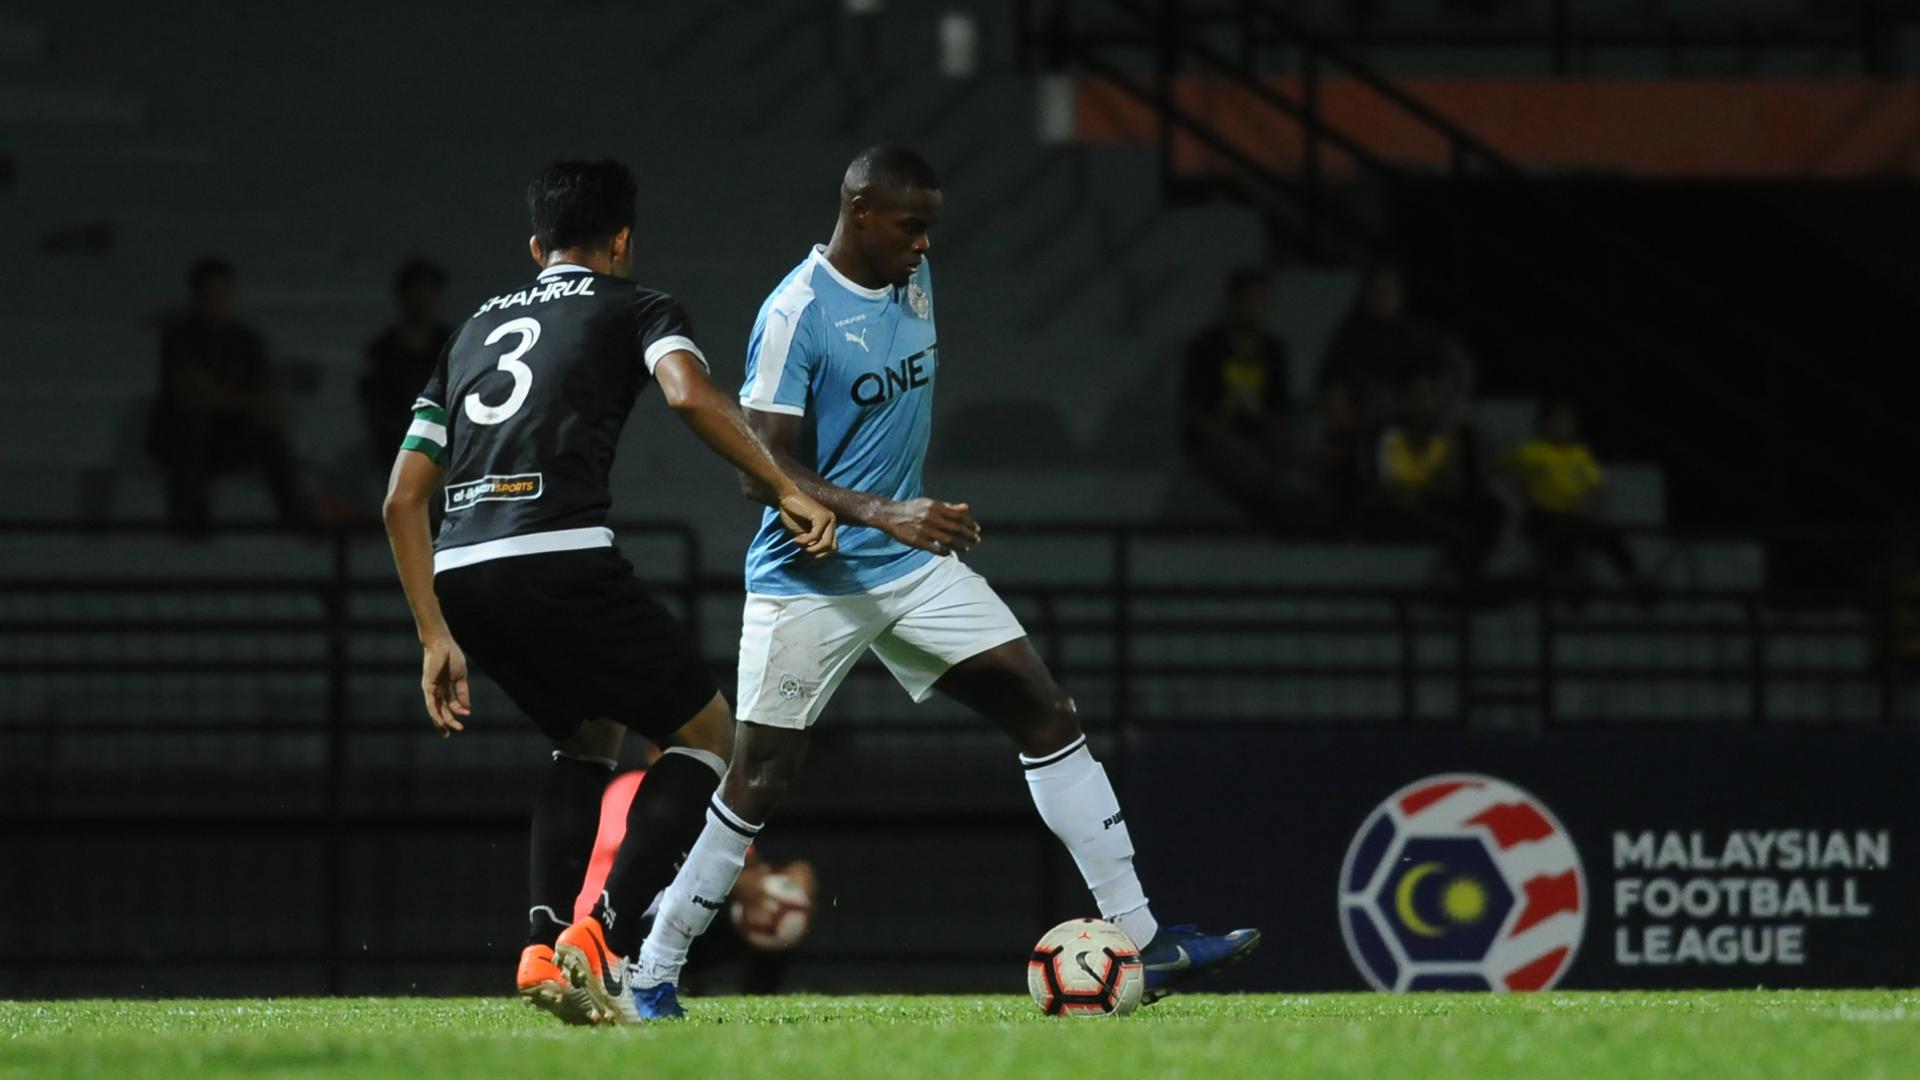 Washingston Brandao, PJ City FC v Perak, Malaysia Super League, 14 Jun 2019